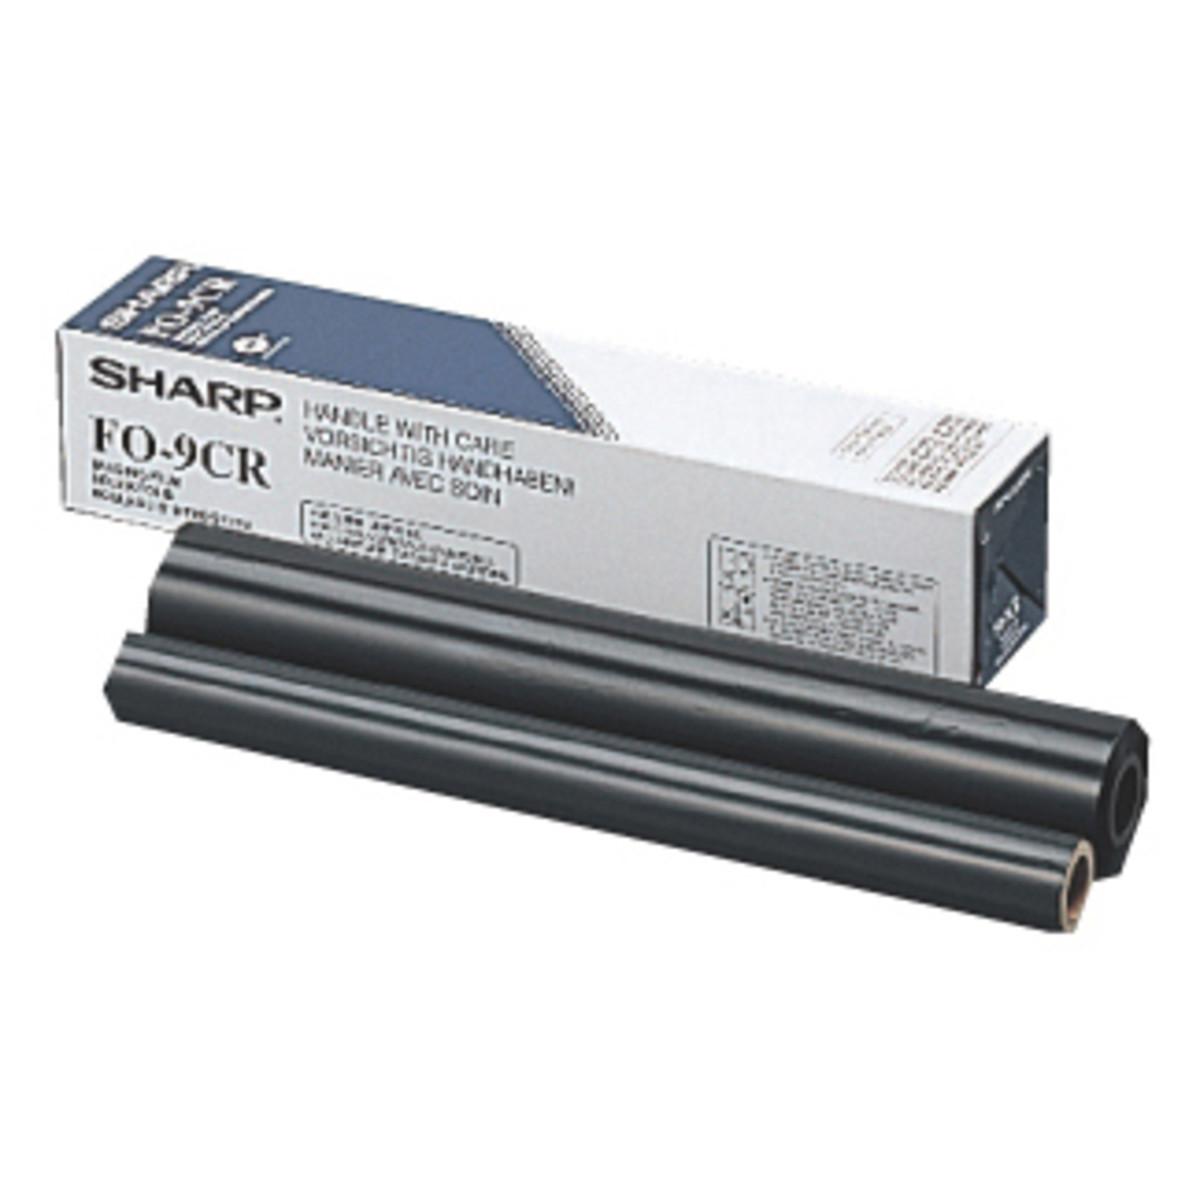 Sharp FO-9CR Thermal Film Cartridge